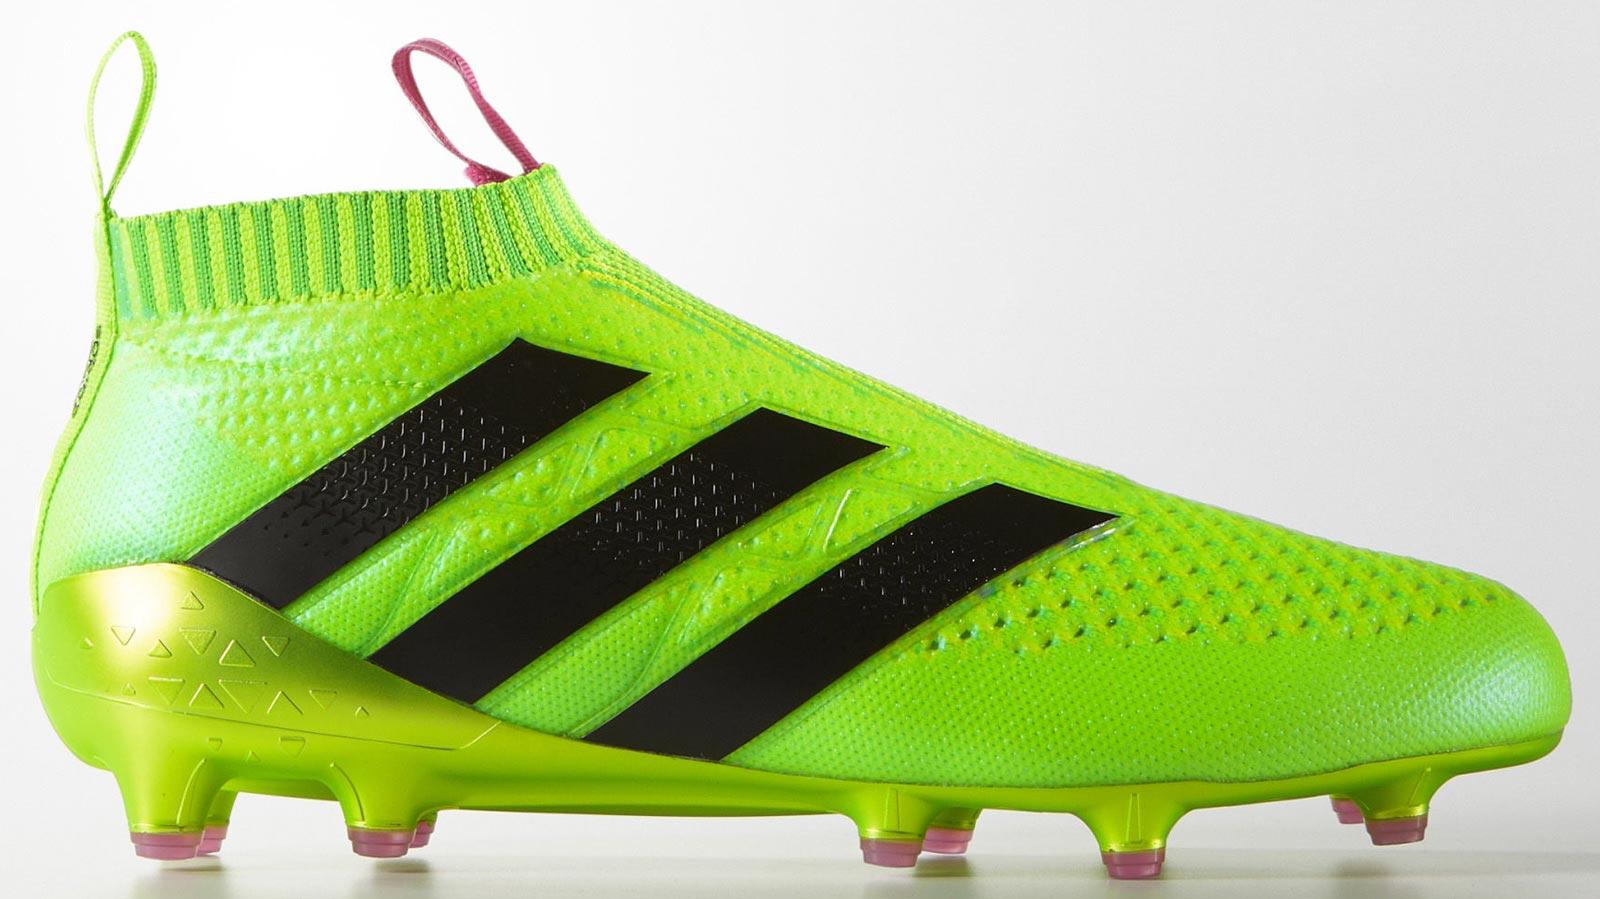 Adidas Ace 16+ PureControl - Grün / Pink / Schwarz